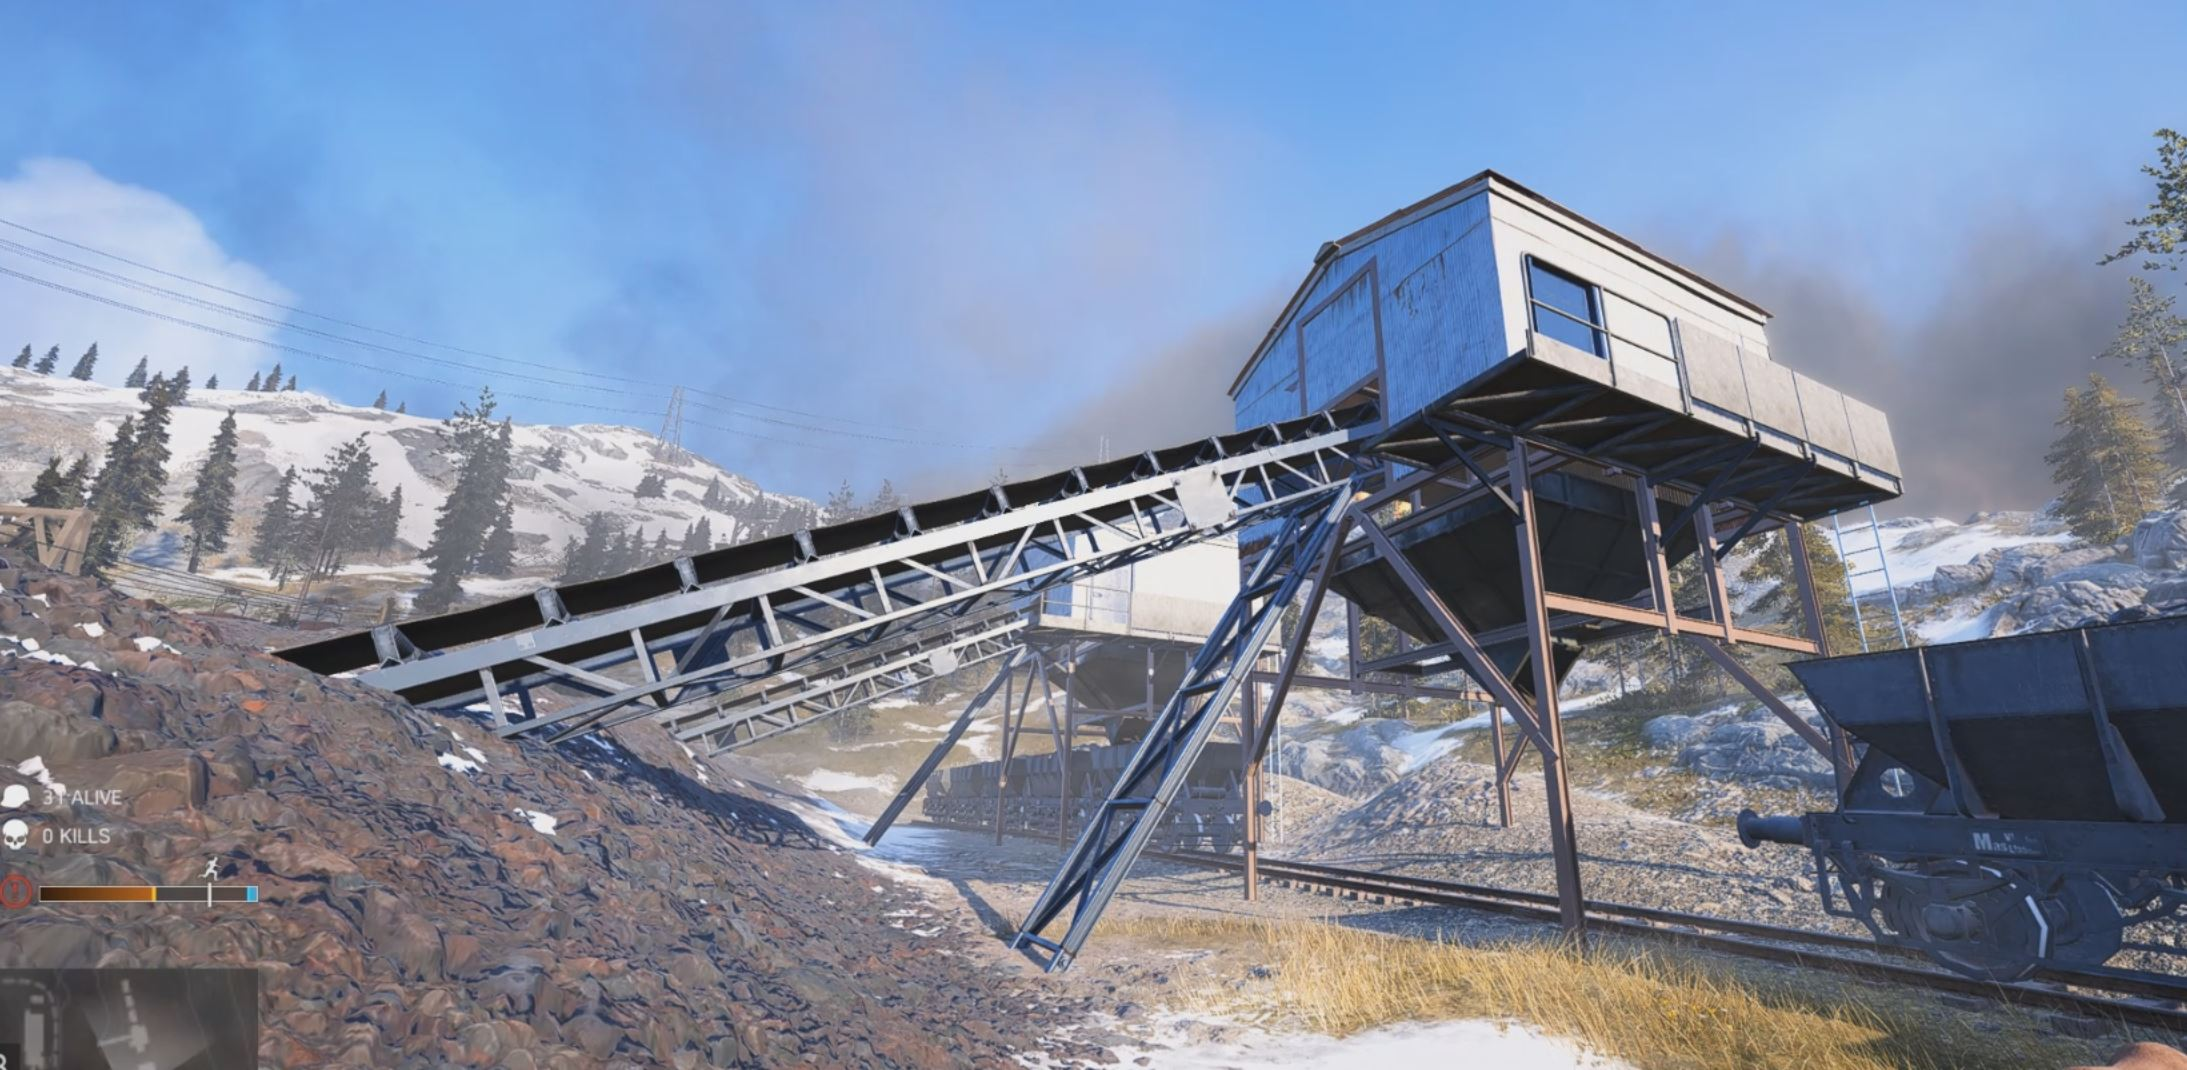 Firestorm building M1